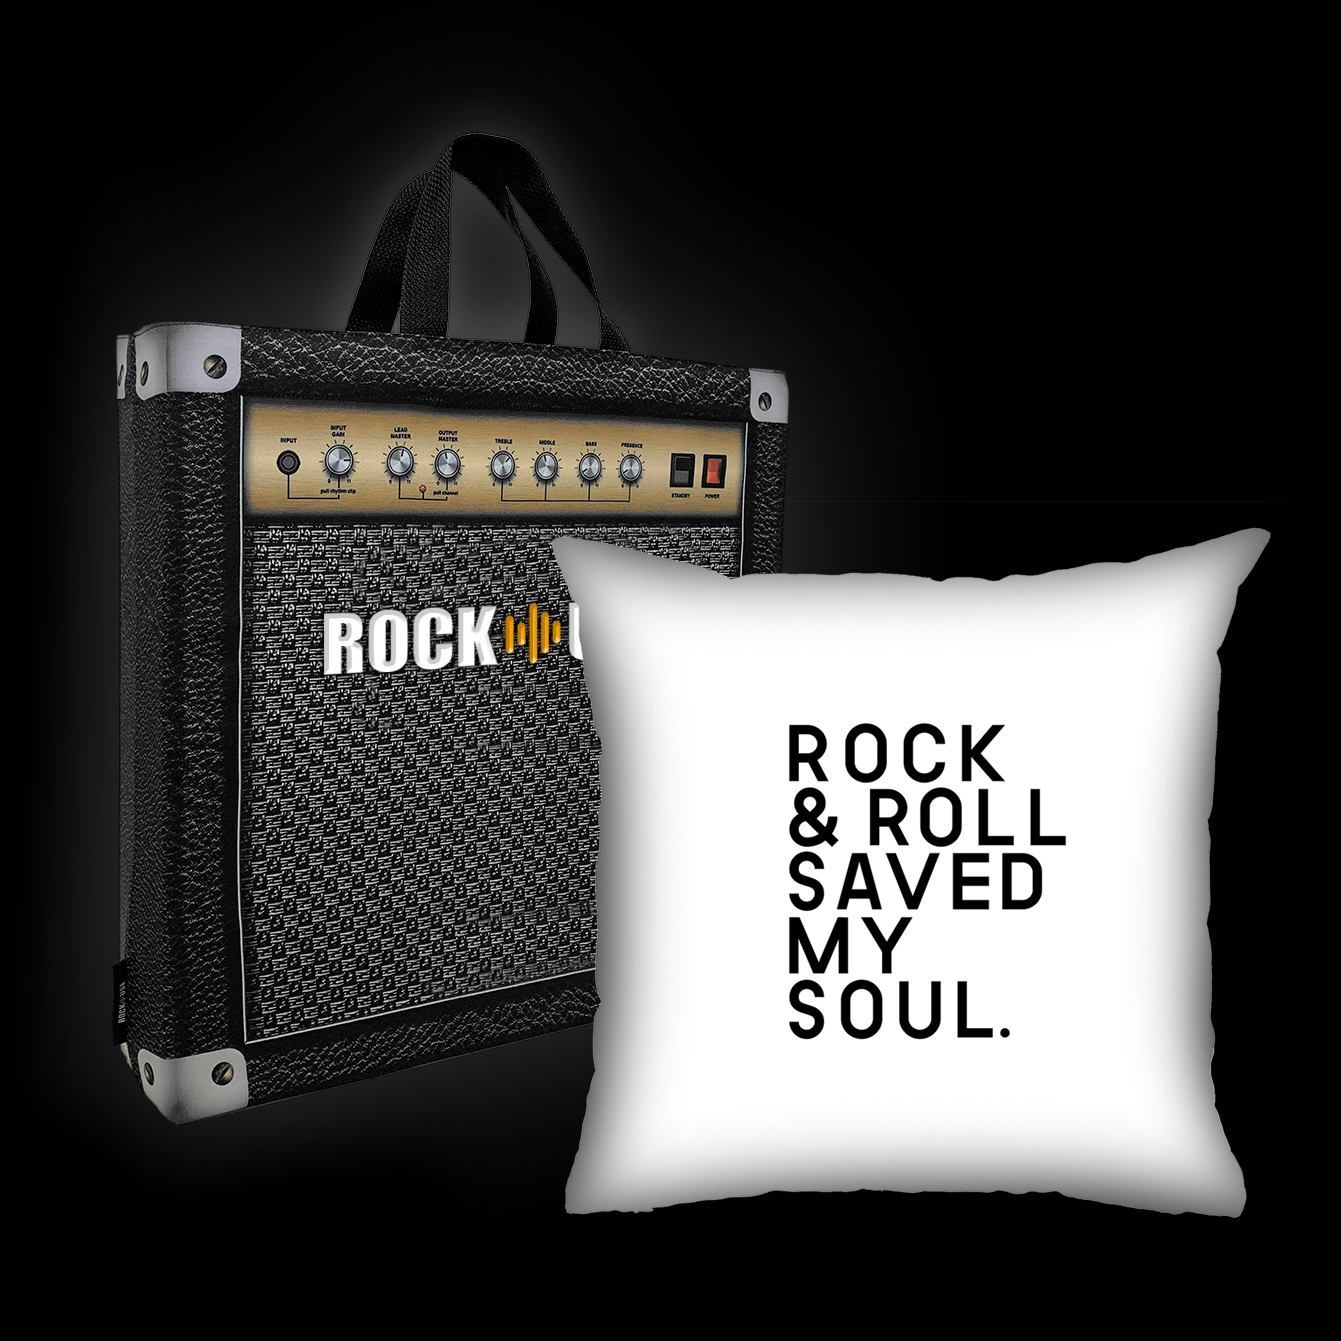 Kit Almofada & Sacola Rock Use - Rock & Roll Saved My Soul - Branca